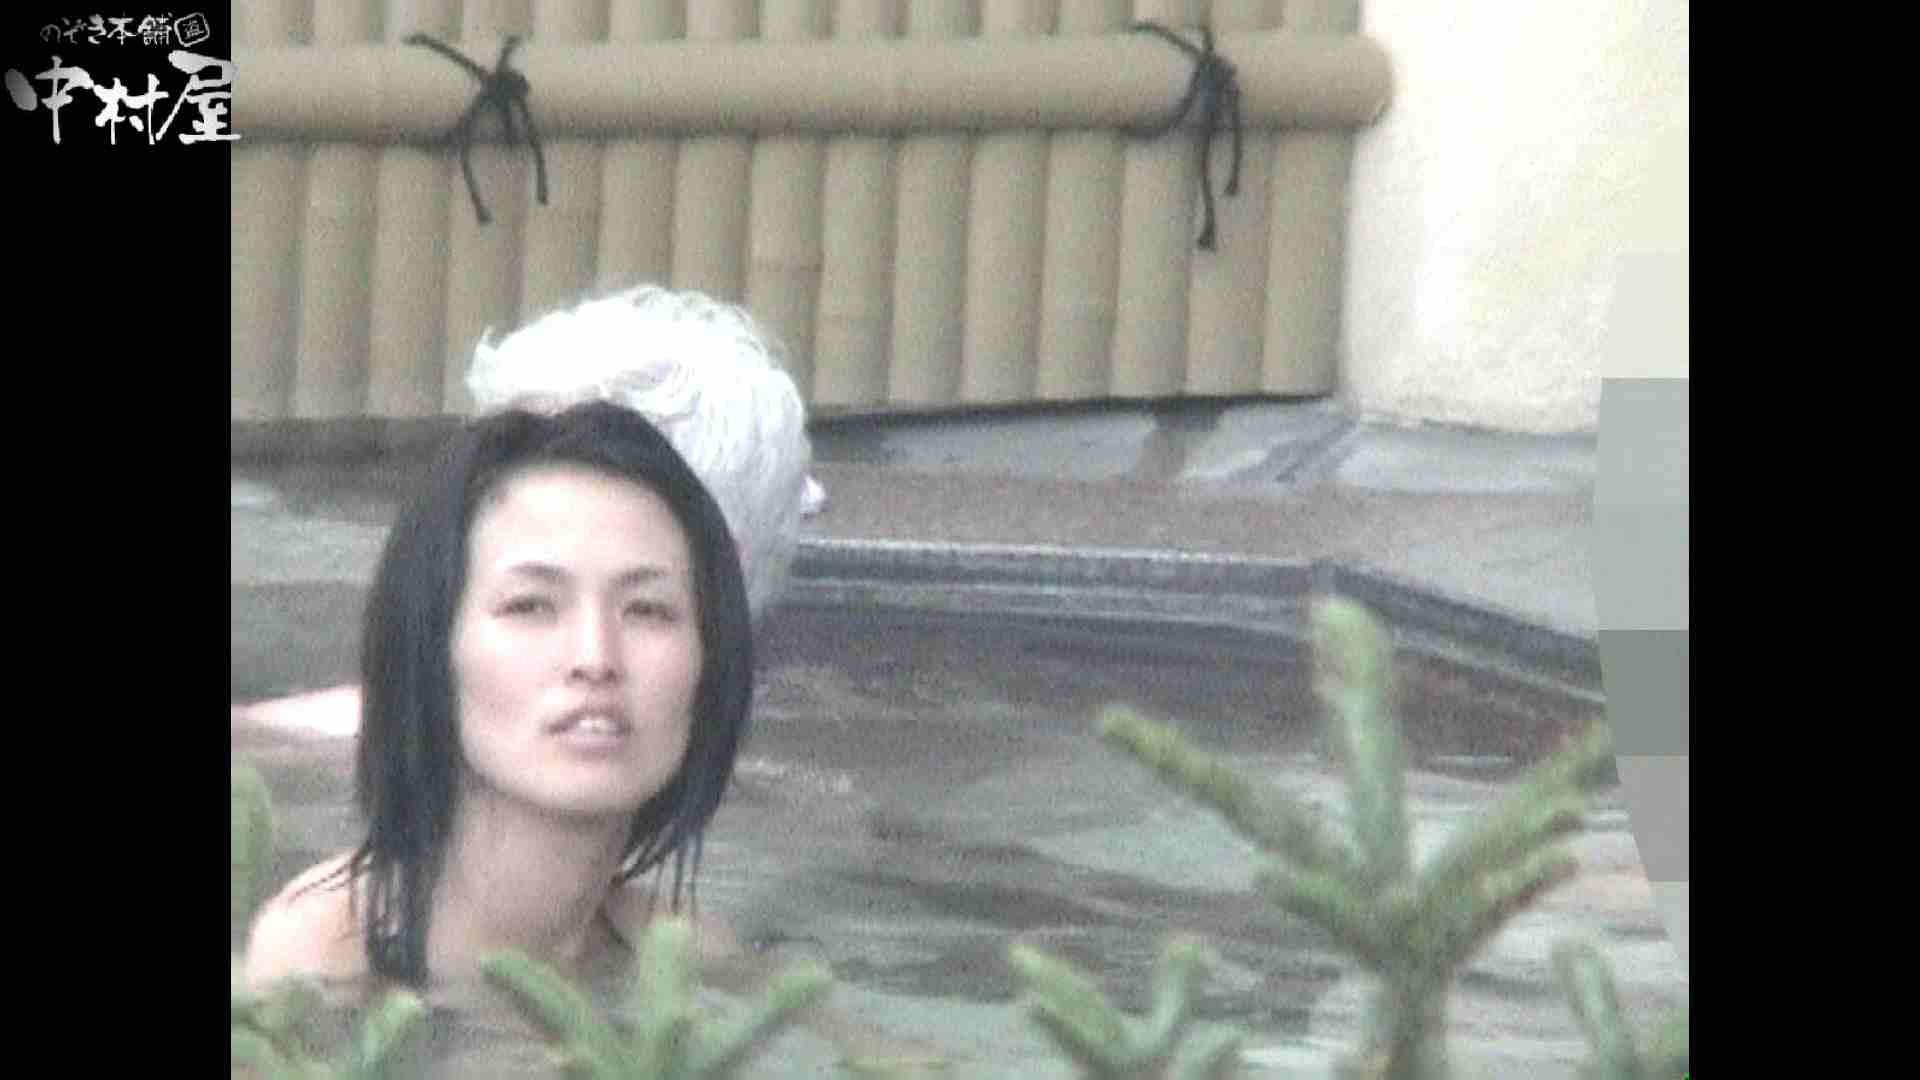 Aquaな露天風呂Vol.933 盗撮 おまんこ動画流出 78PICs 29